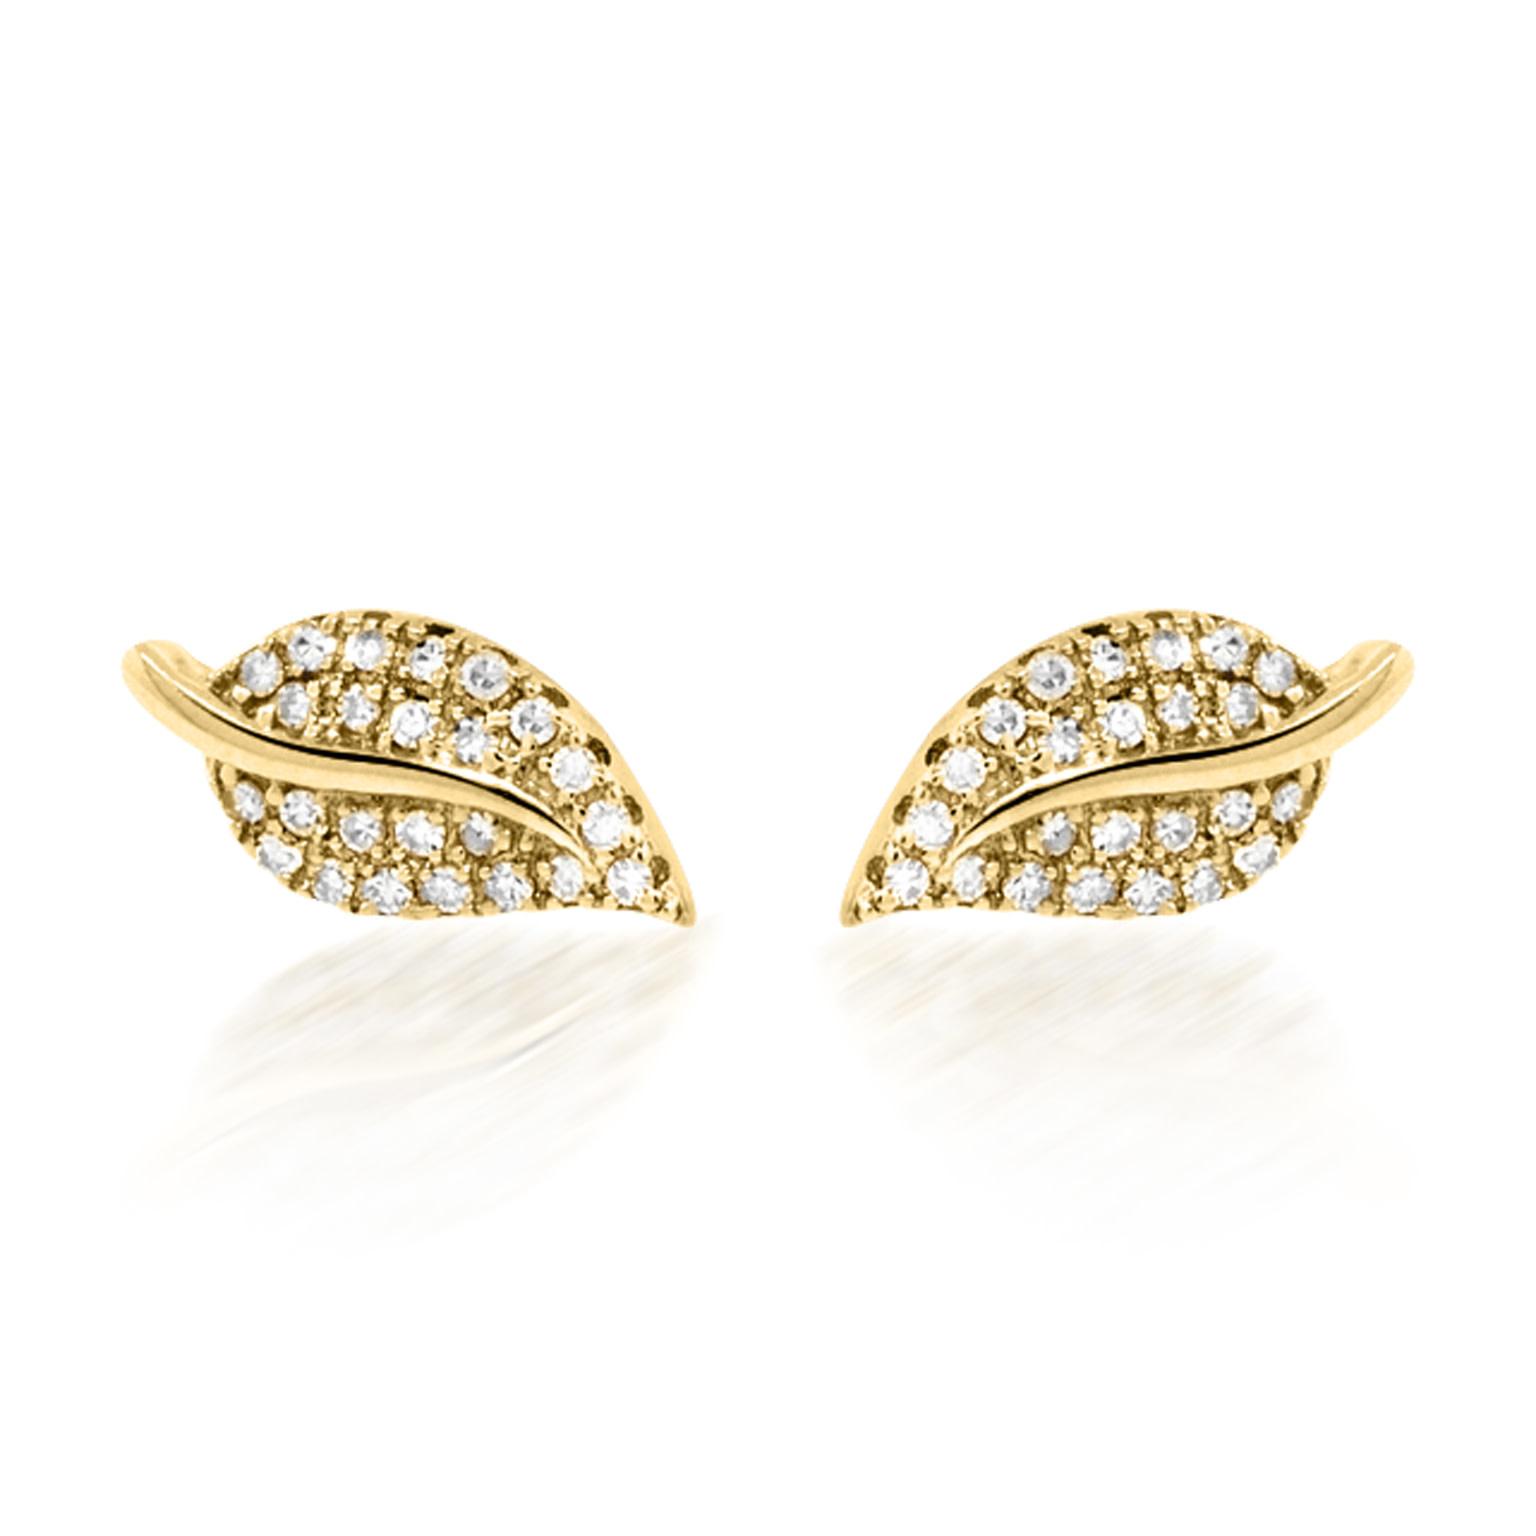 Trabert Goldsmiths Diamond Gold Leaf Stud Earrings